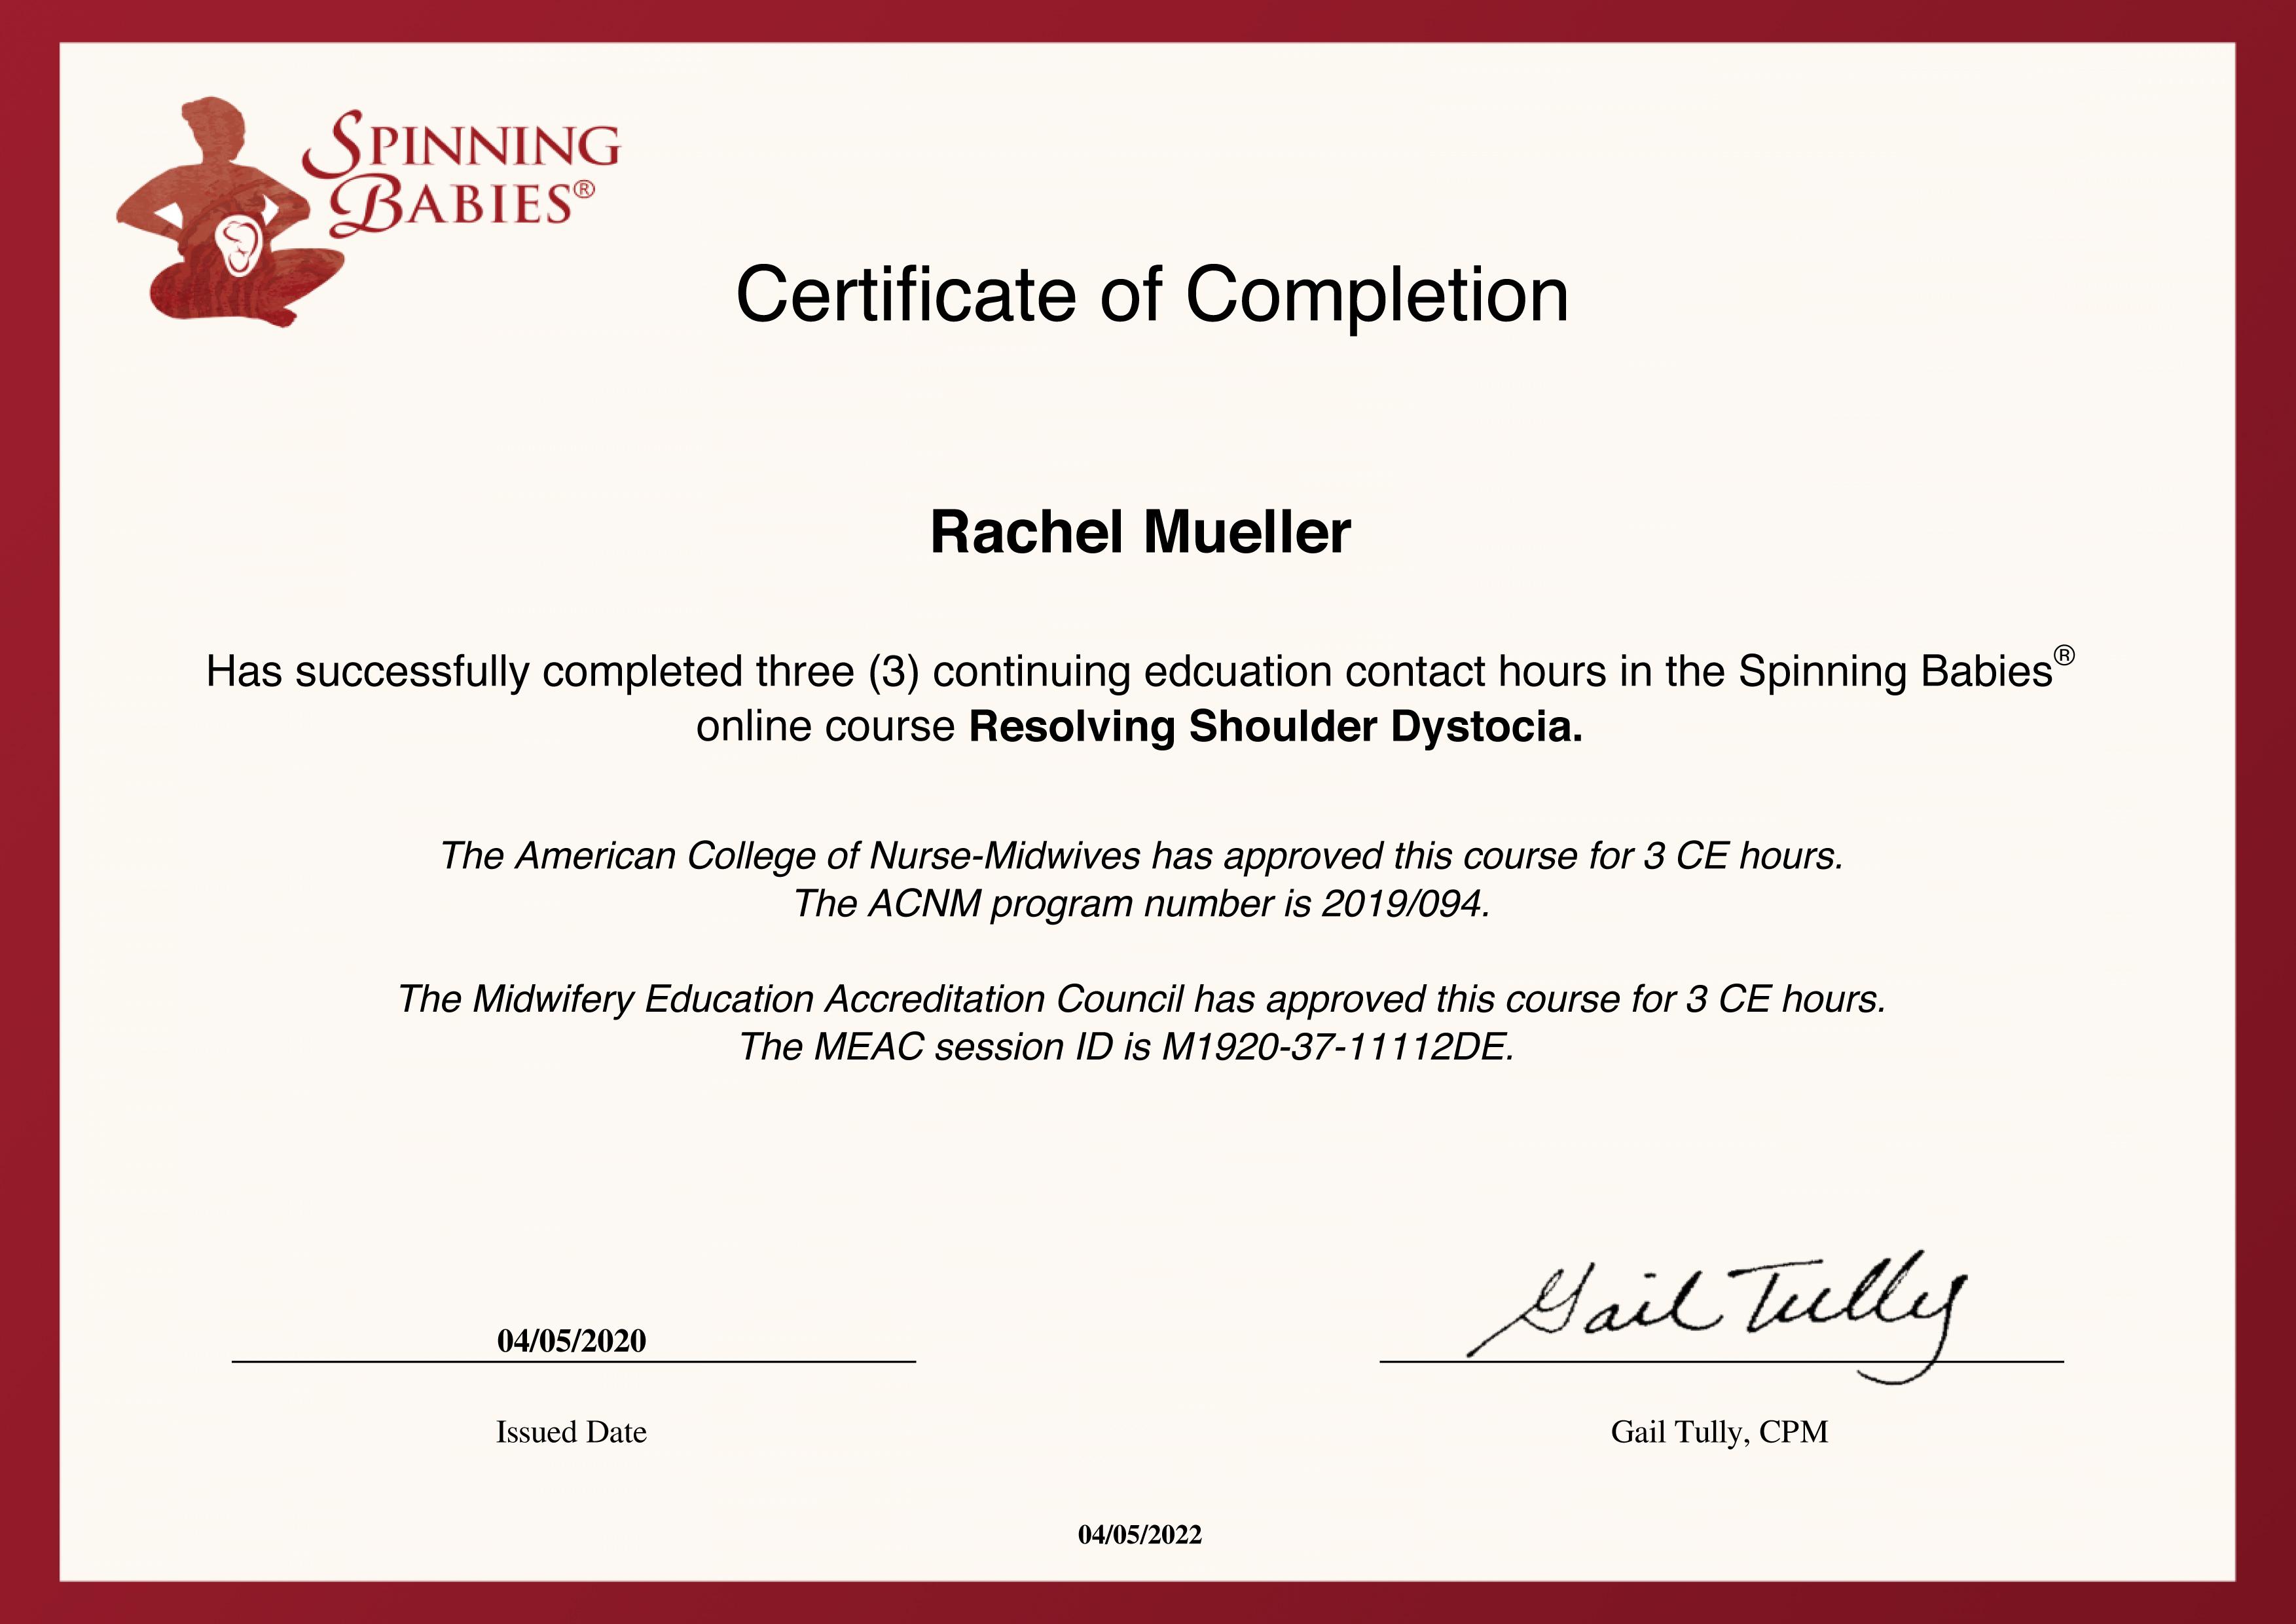 Certification for Resolving Shoulder Dystocia